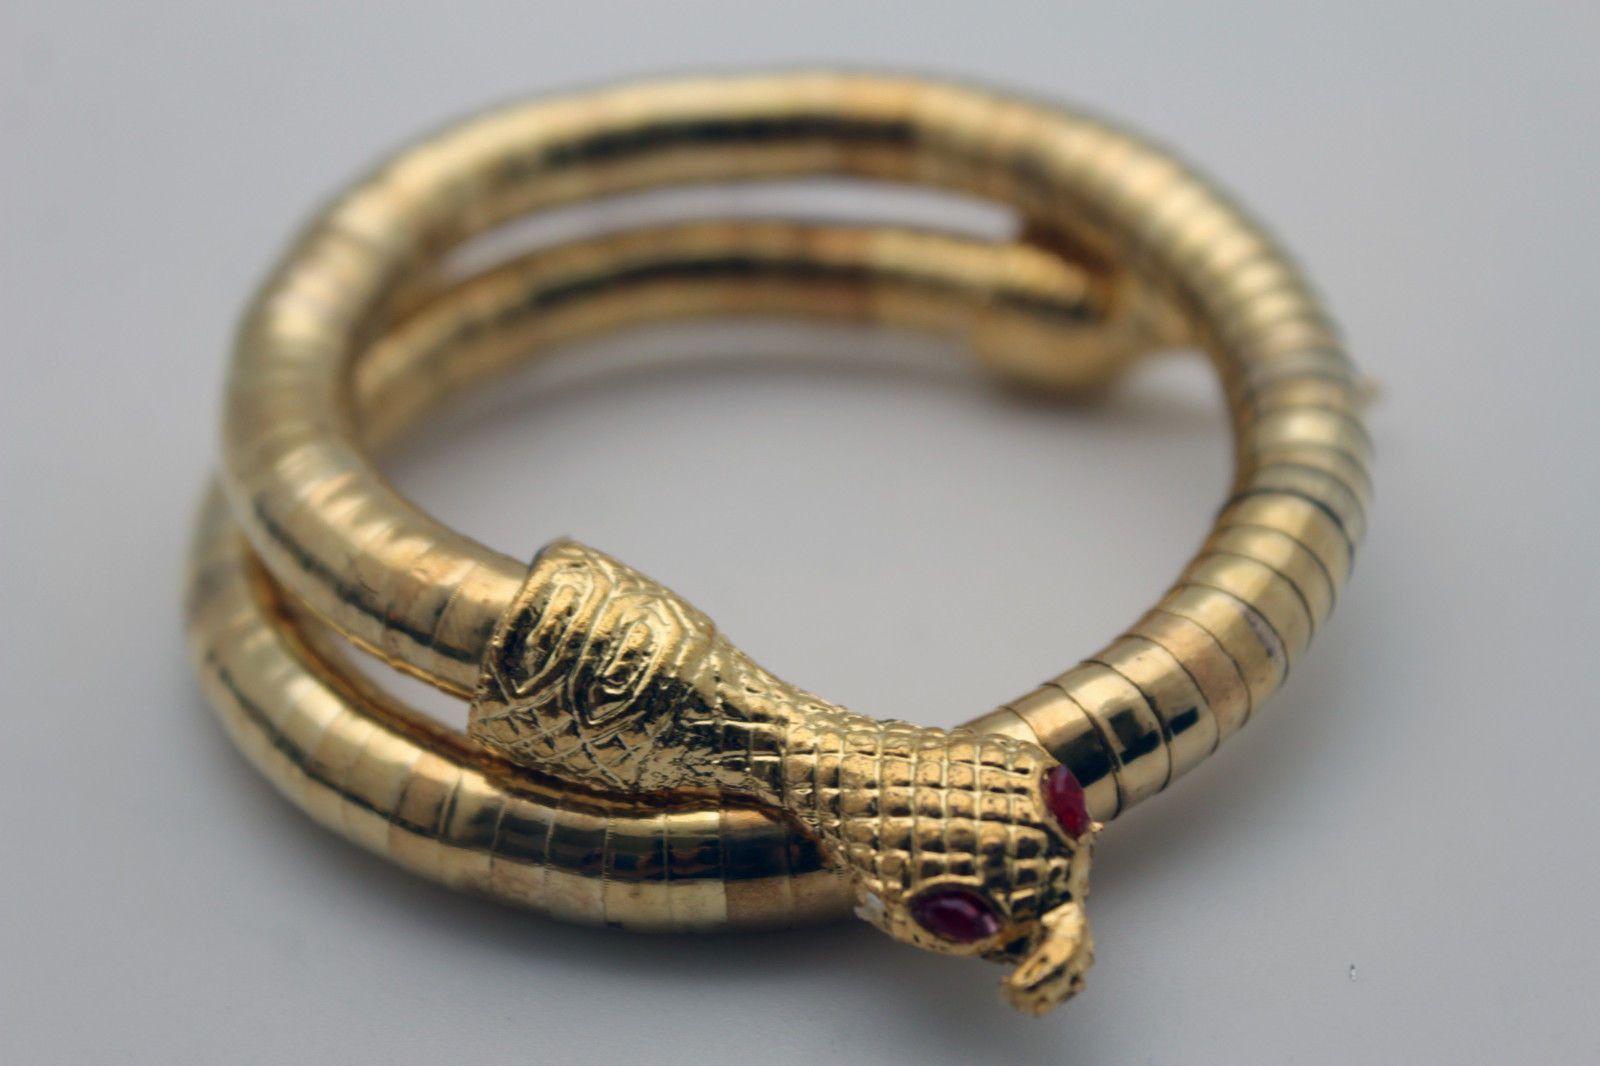 5a1dfb8c8f7 Gold Silver Cobra Snake Red Eyes Bracelet High Arm Cuff Bangle New ...